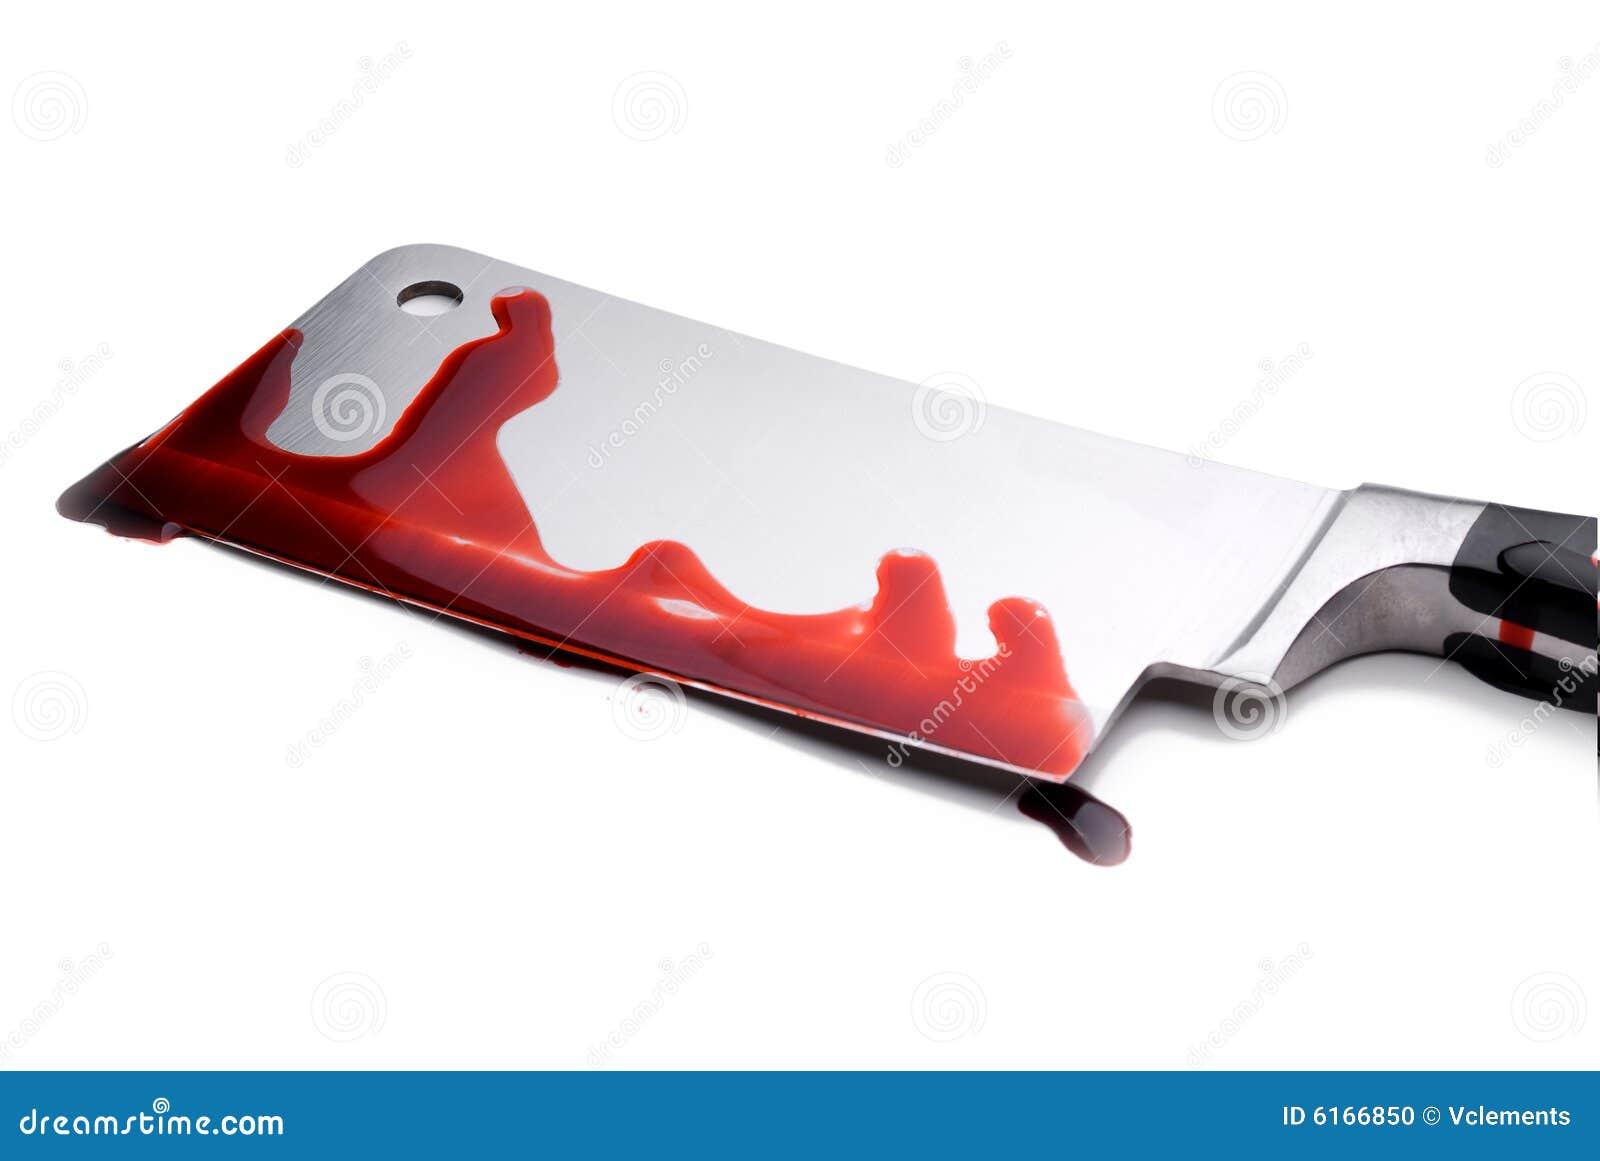 u8840 u6dcb u6dcb u7684 u5c60 u5200 knife clip art pictures knife clip art free